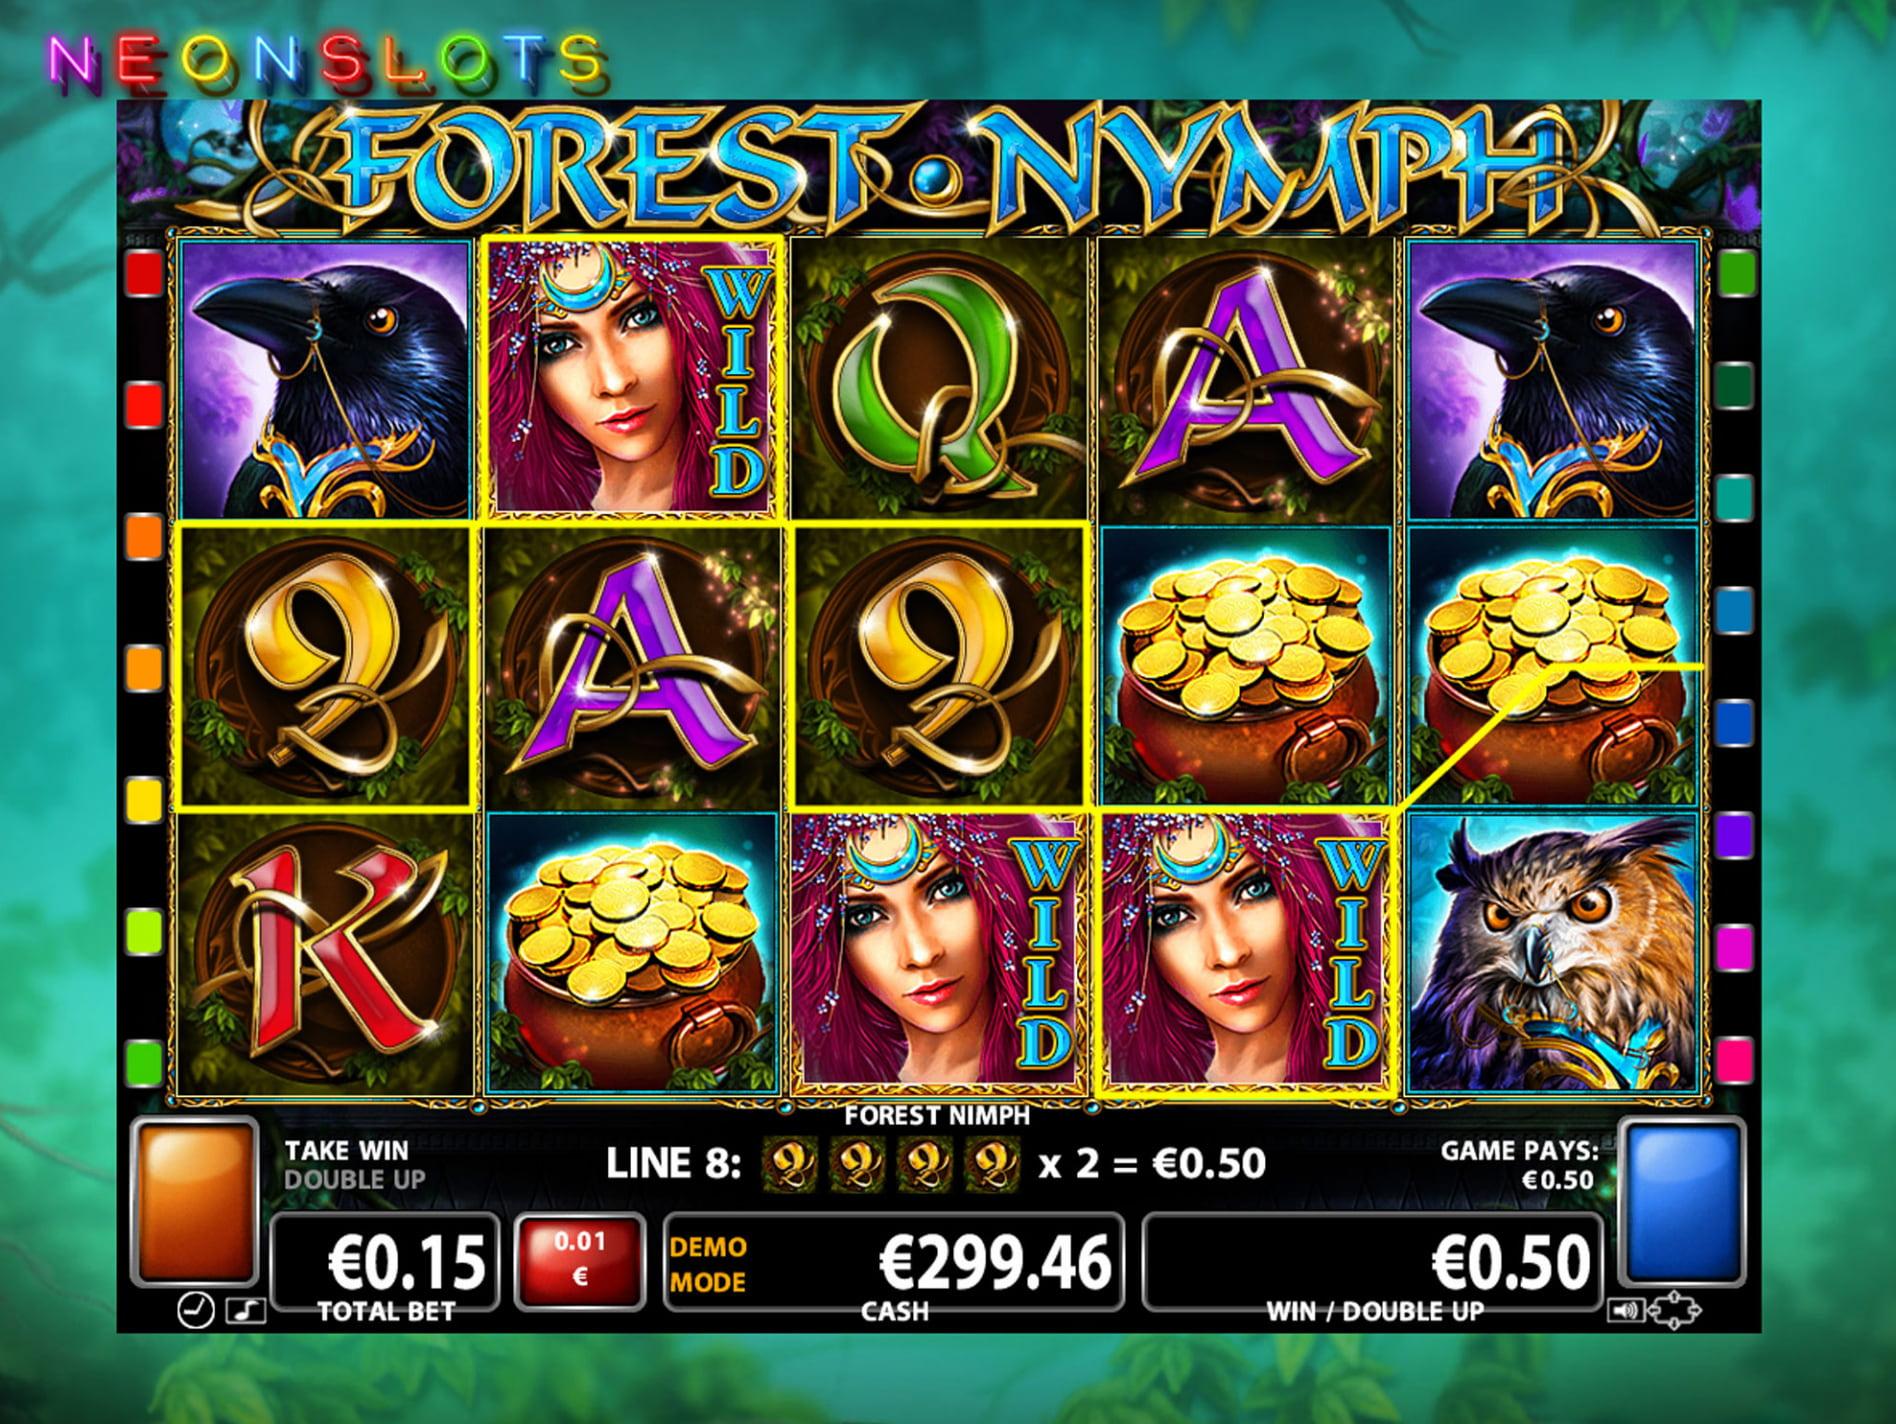 Ruleta con premios reales casino online Bolivia gratis tragamonedas - 2487